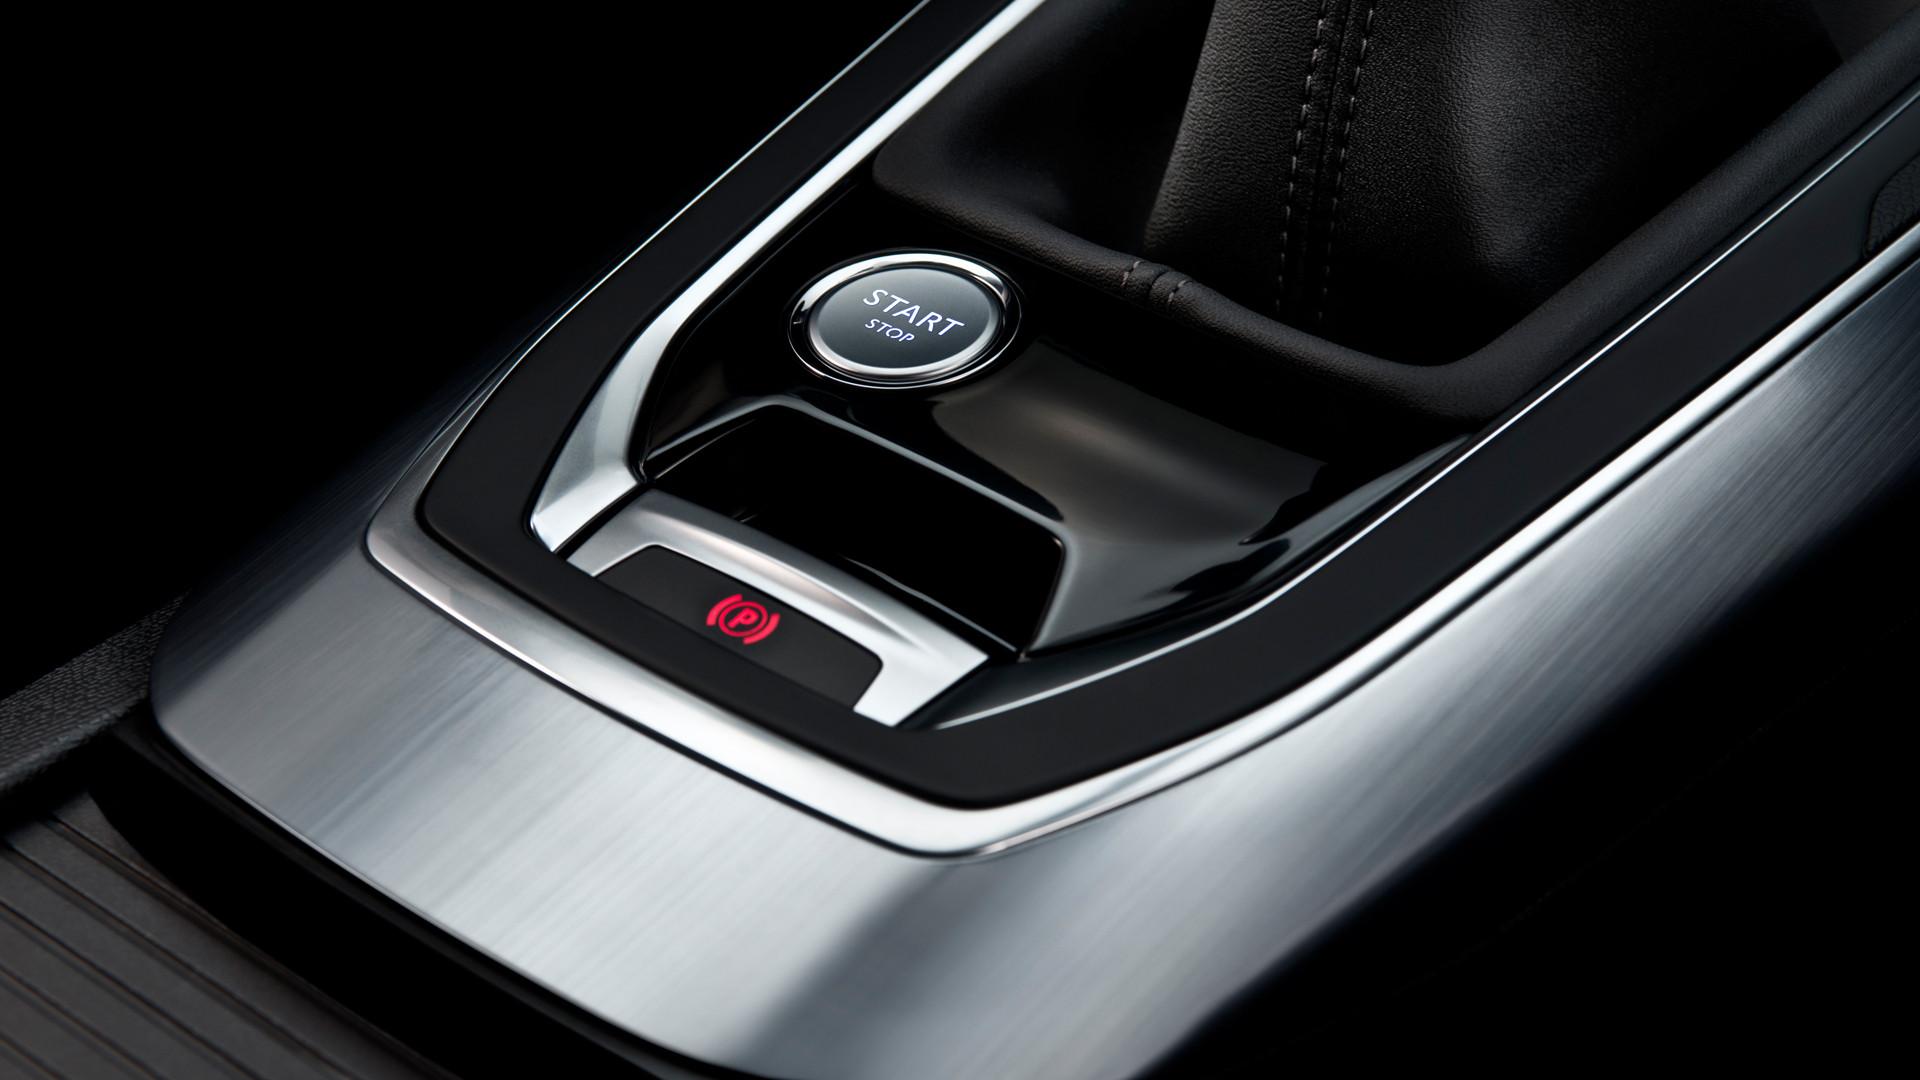 2017 Yeni Peugeot 308 Techno Edition Fiyatı